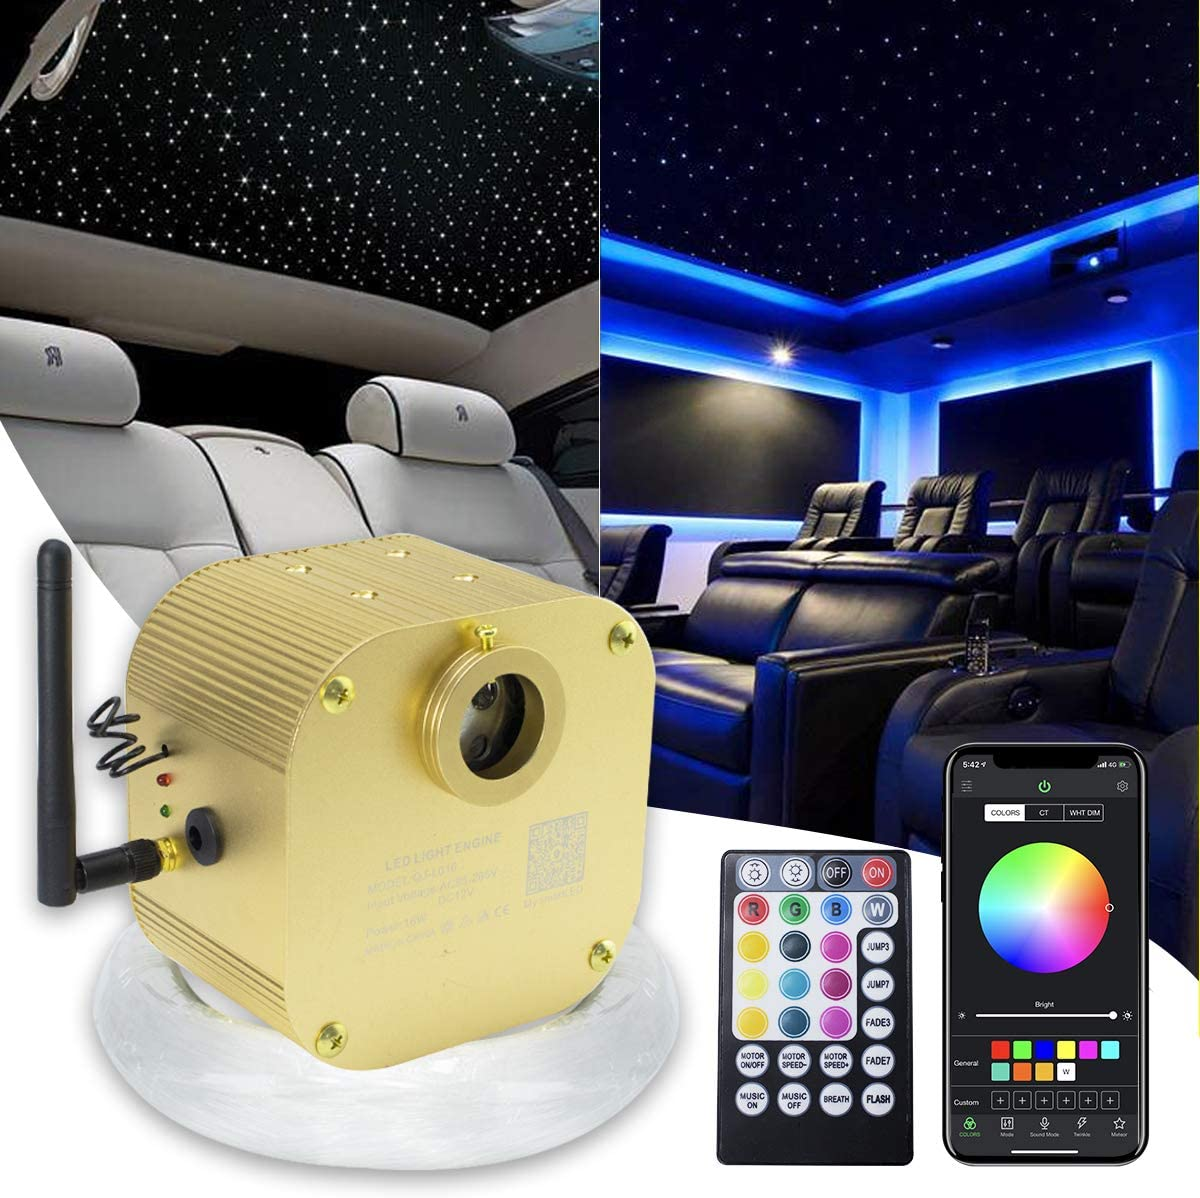 Kingmaled 16 W Car Home App Twinkle Musique Activé Fiber Optic Star Plafond Kit,